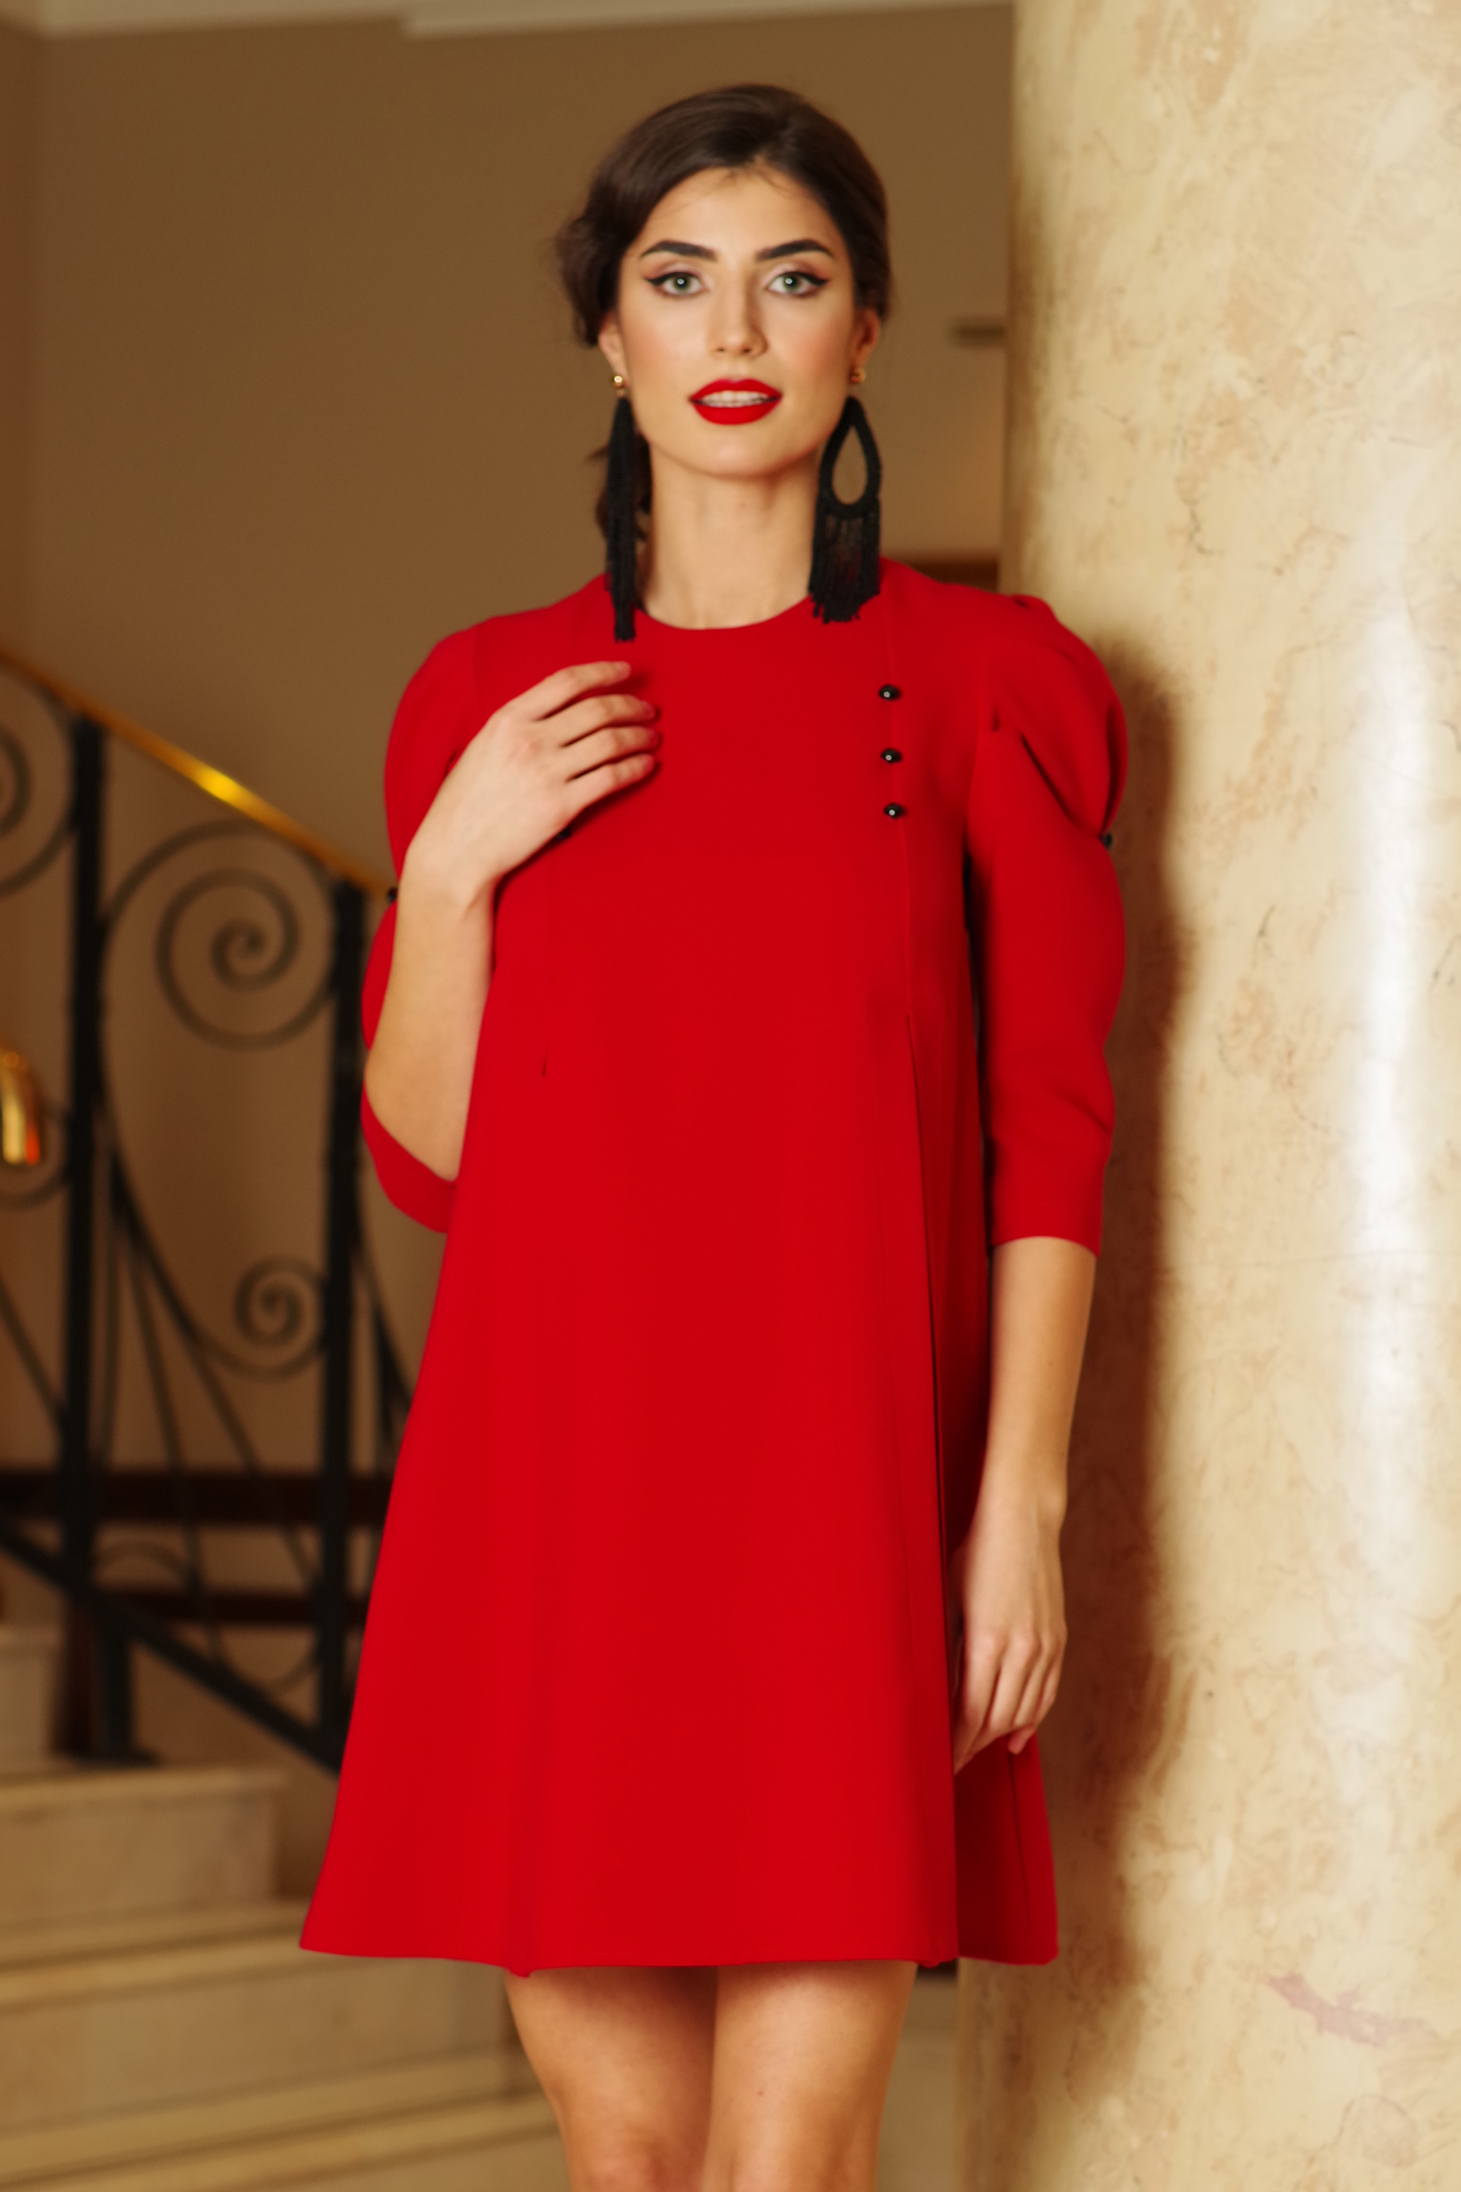 Rochie Artista rosie de zi cu croi larg din stofa usor elastica accesorizata cu nasturi cu maneci trei-sferturi